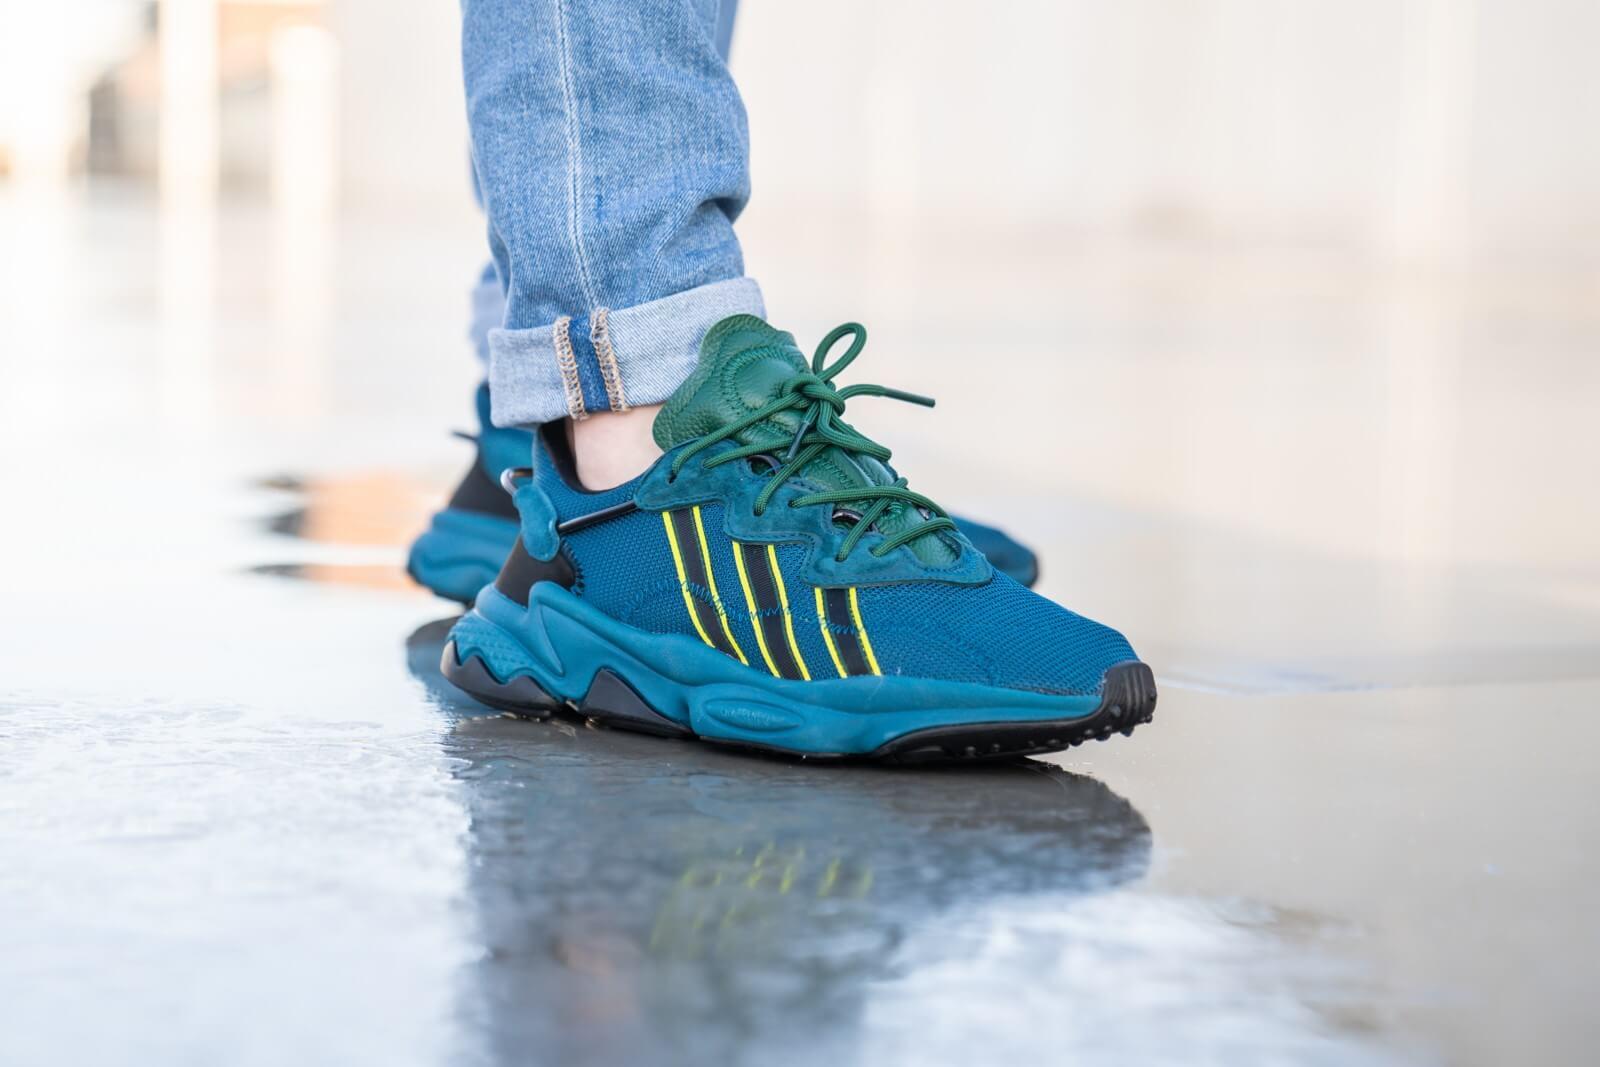 Adidas x Pusha T Ozweego Tech Mineral